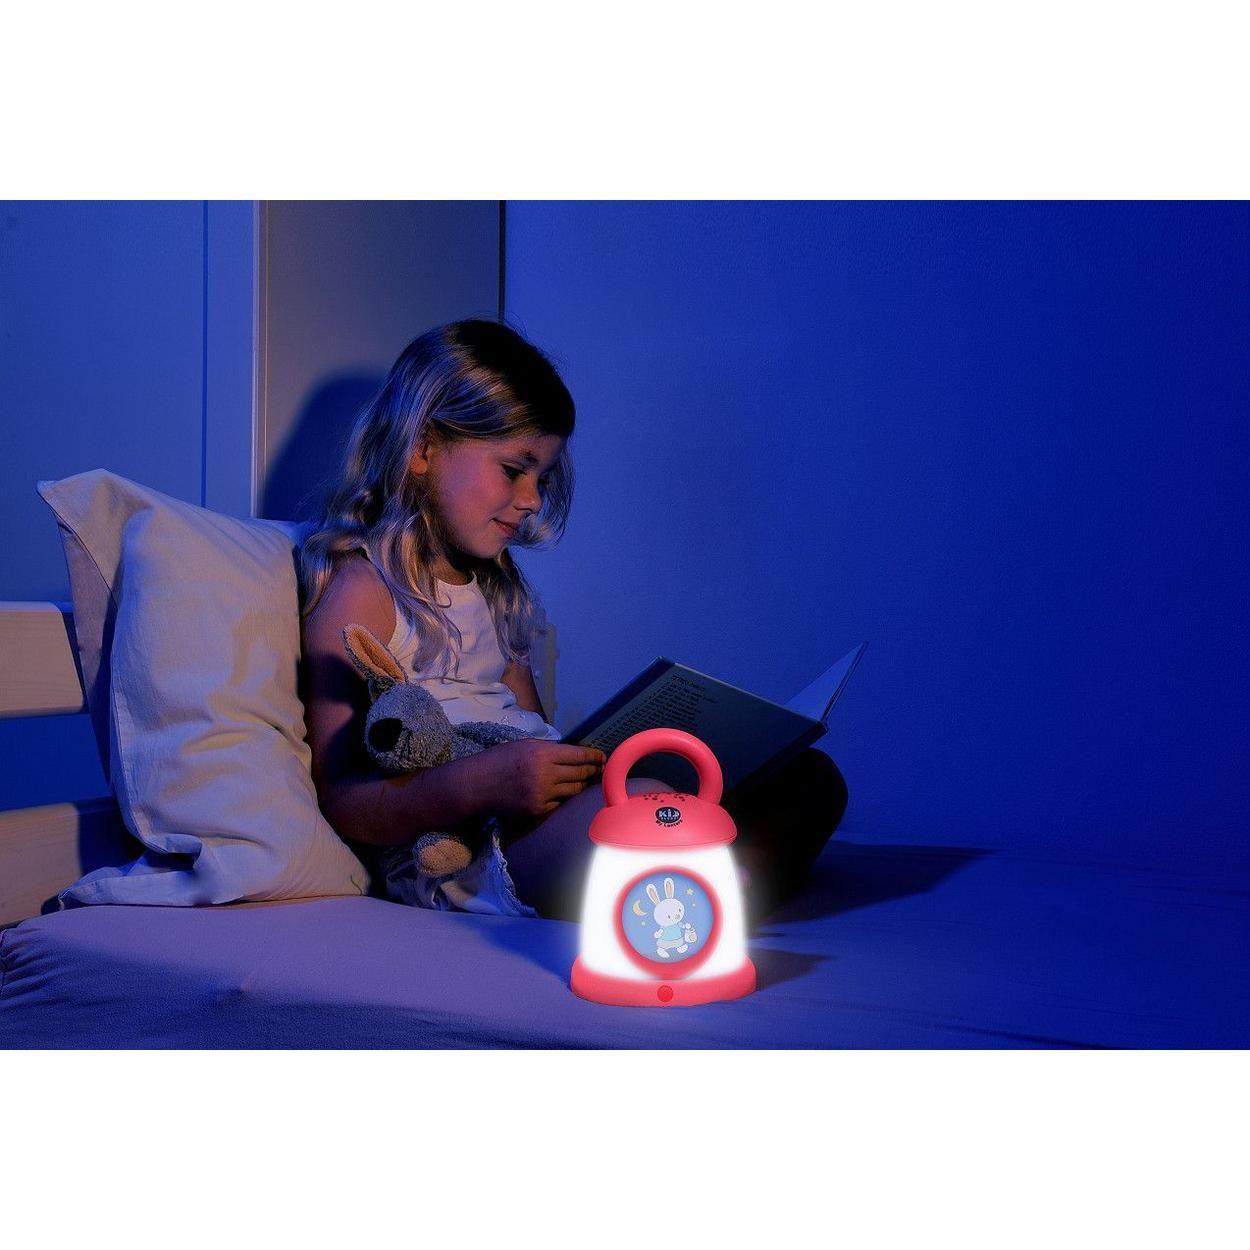 Kid Sleep my LanternFuchsia for 44.99 Kids sleep, Kids